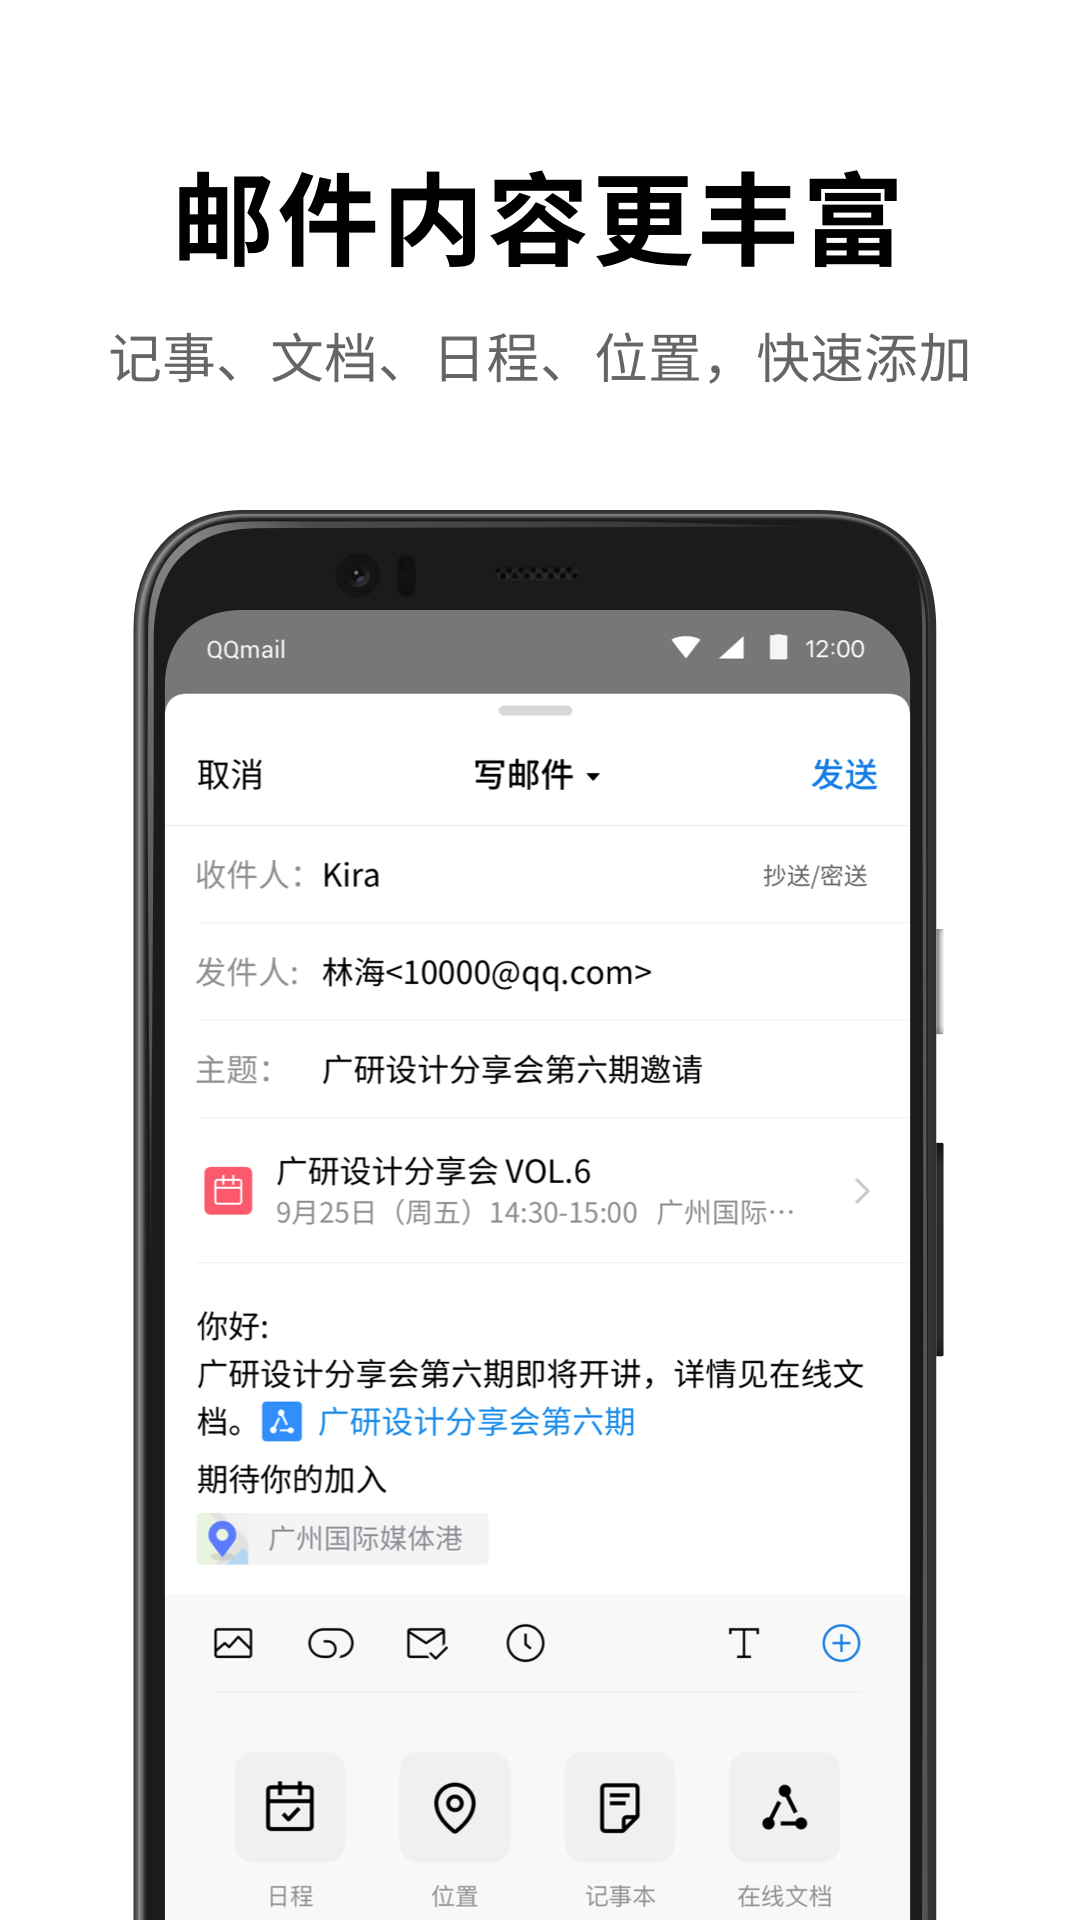 QQ邮箱ios版 V6.1.0